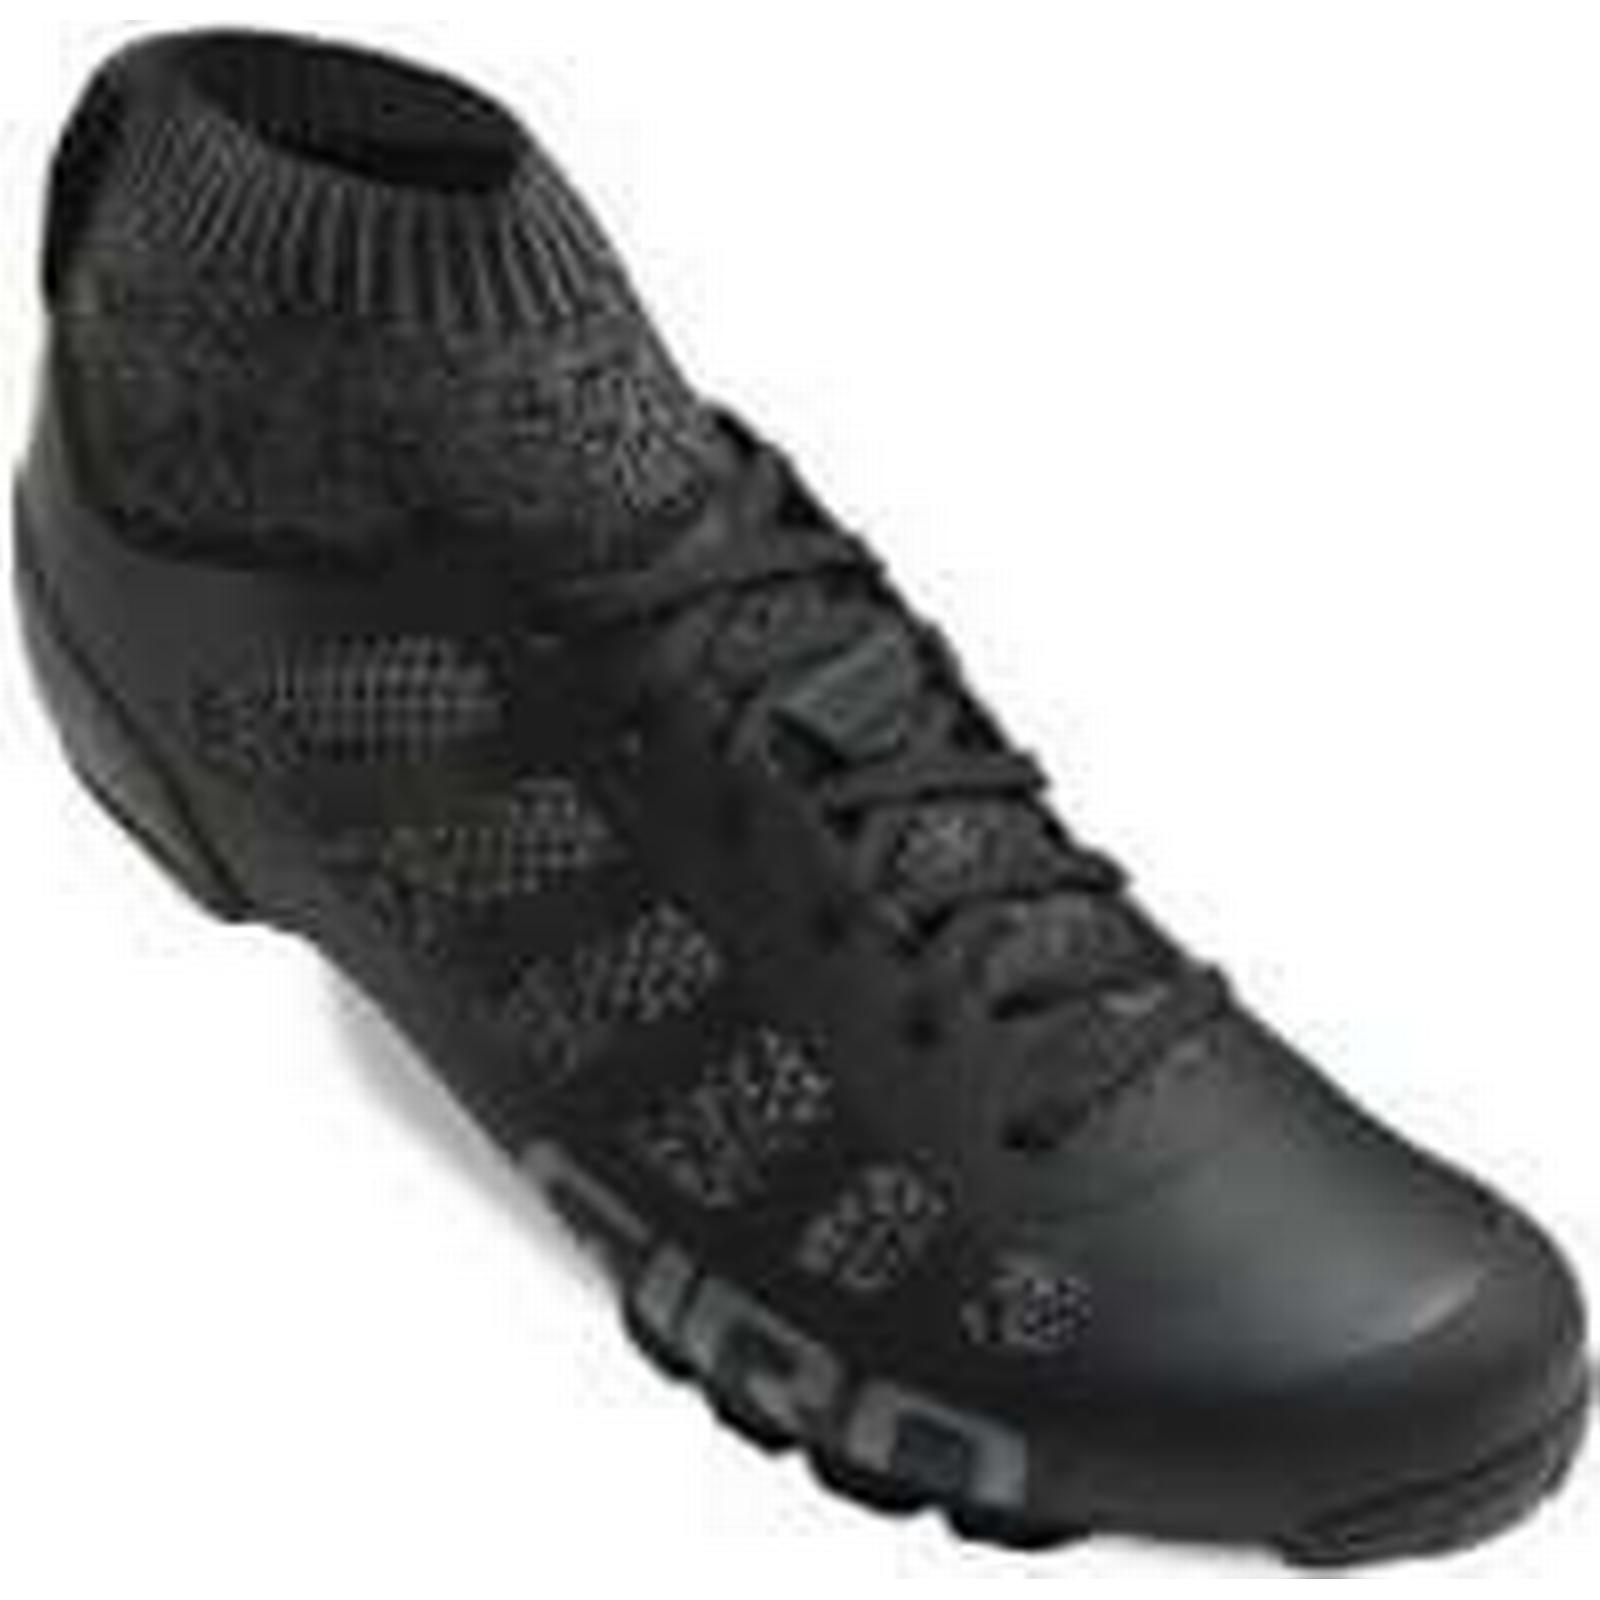 Giro Empire VR70 MTB Cycling Shoes 41.5/UK - Black/Charcoal - EU 41.5/UK Shoes 7.5 - Black 55026c